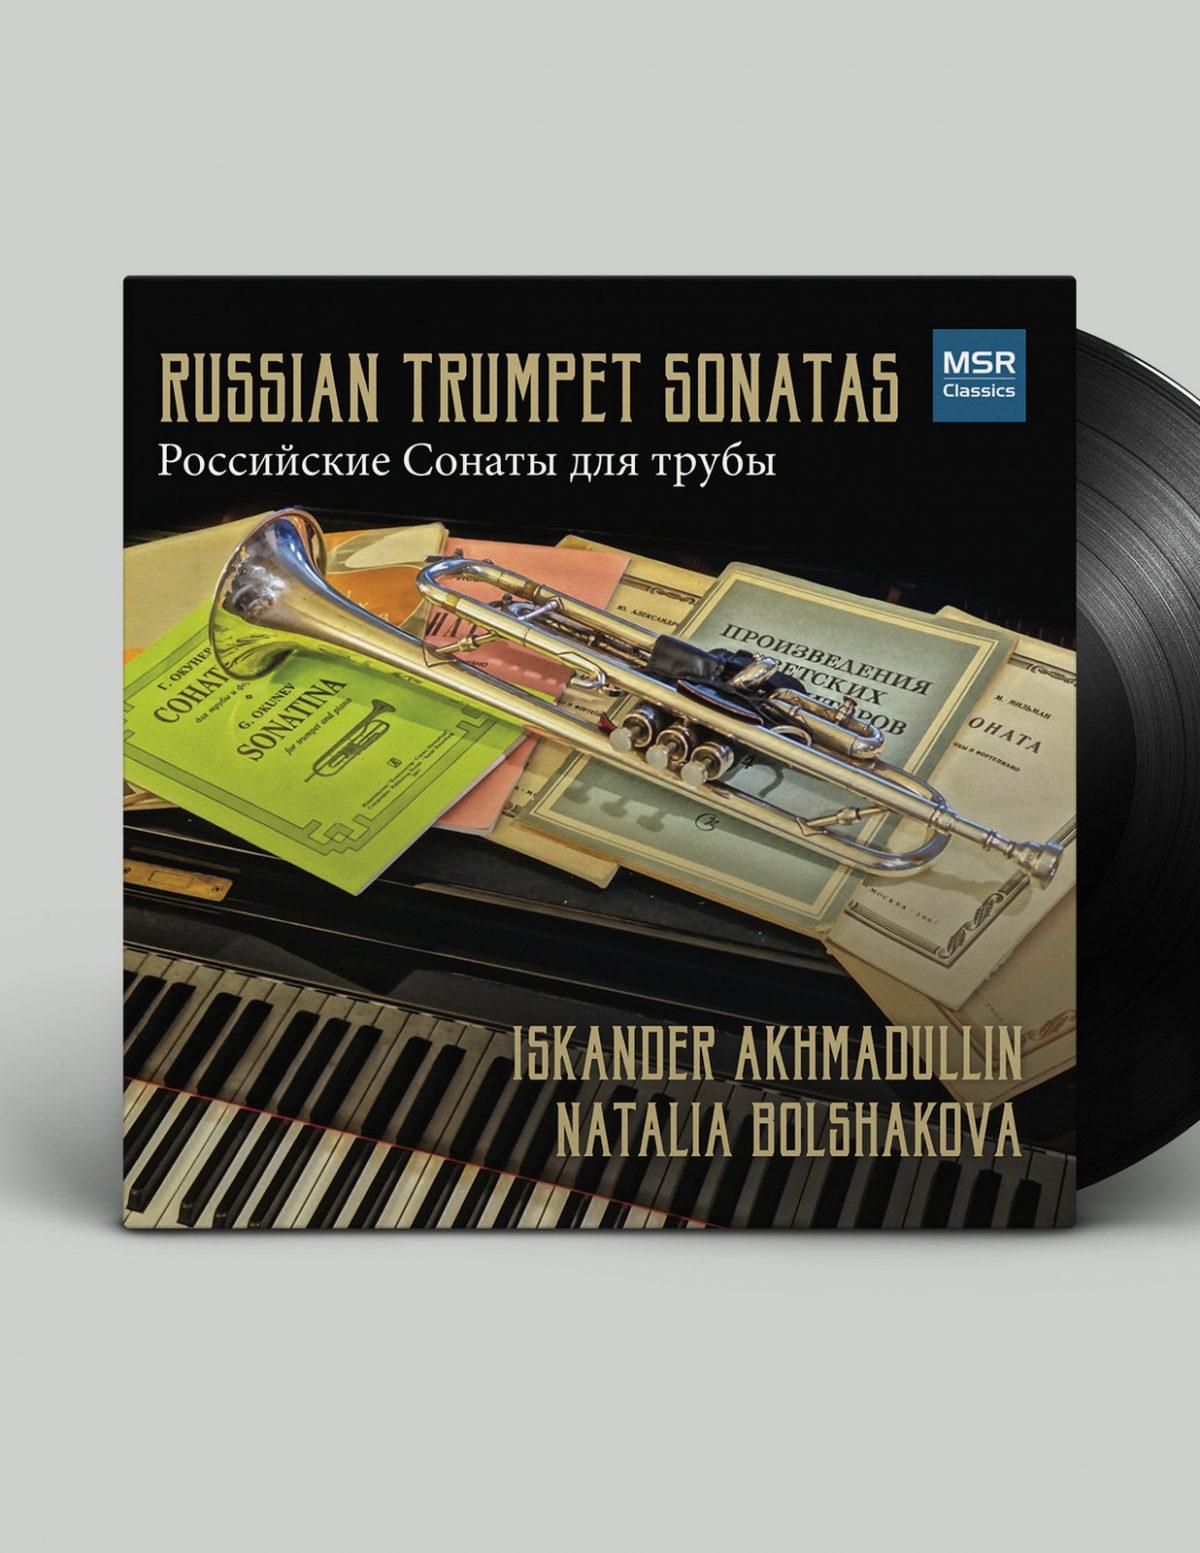 Russian Album Cover-1